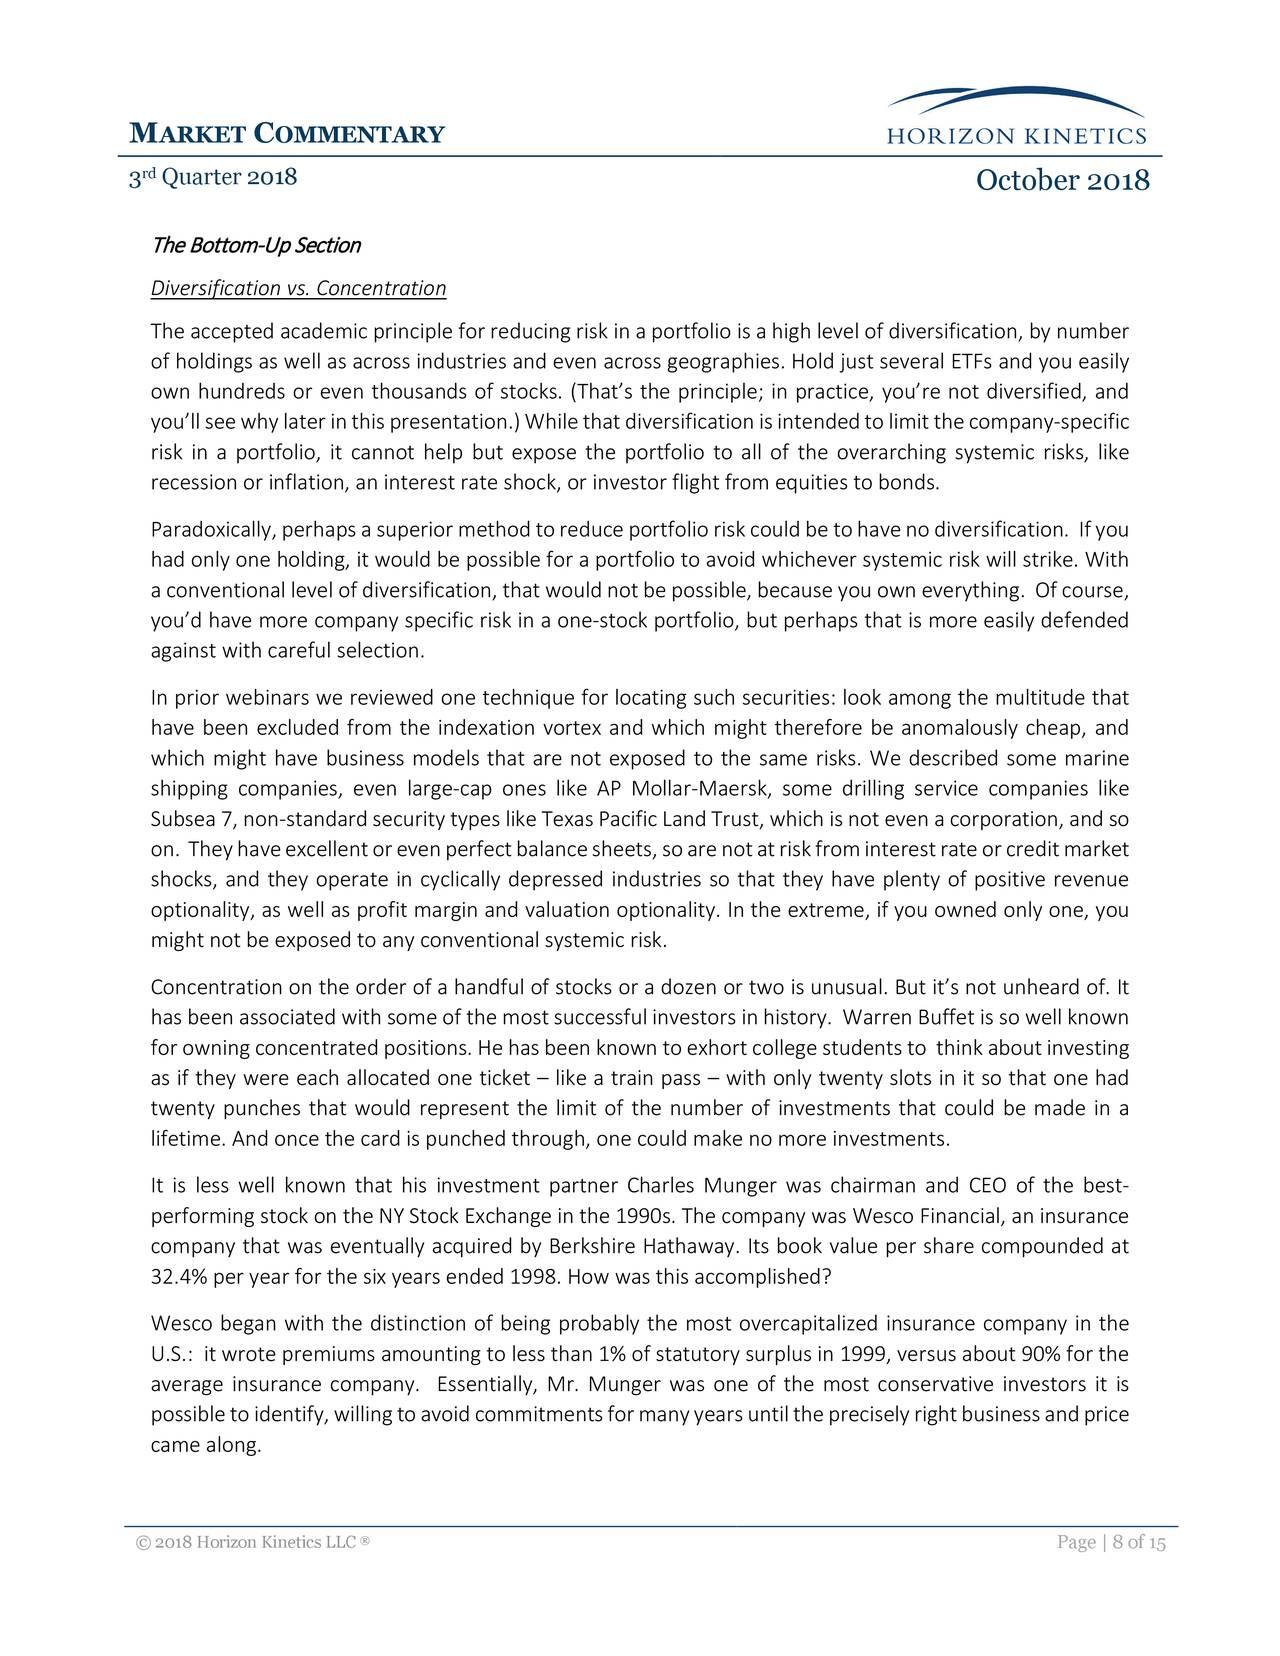 Horizon Kinetics Commentary Q3 2018 - CACI International Inc